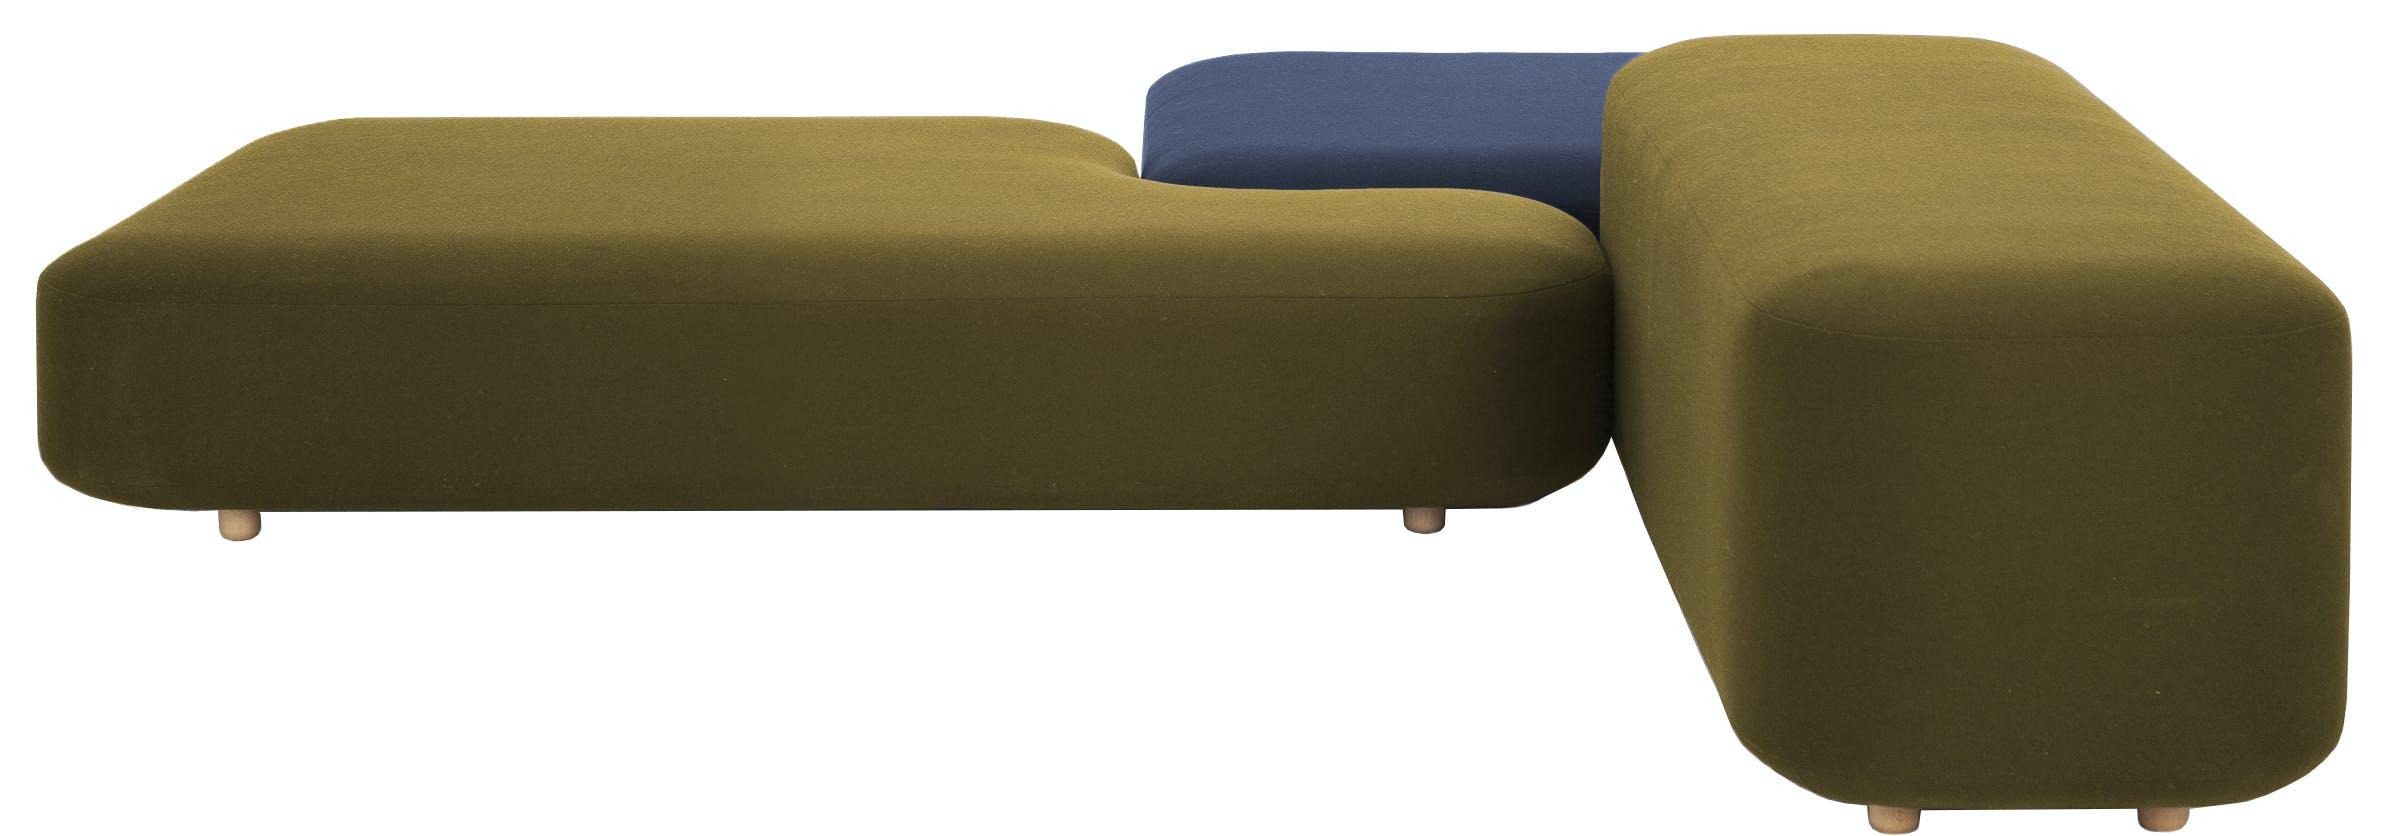 Common Sofa